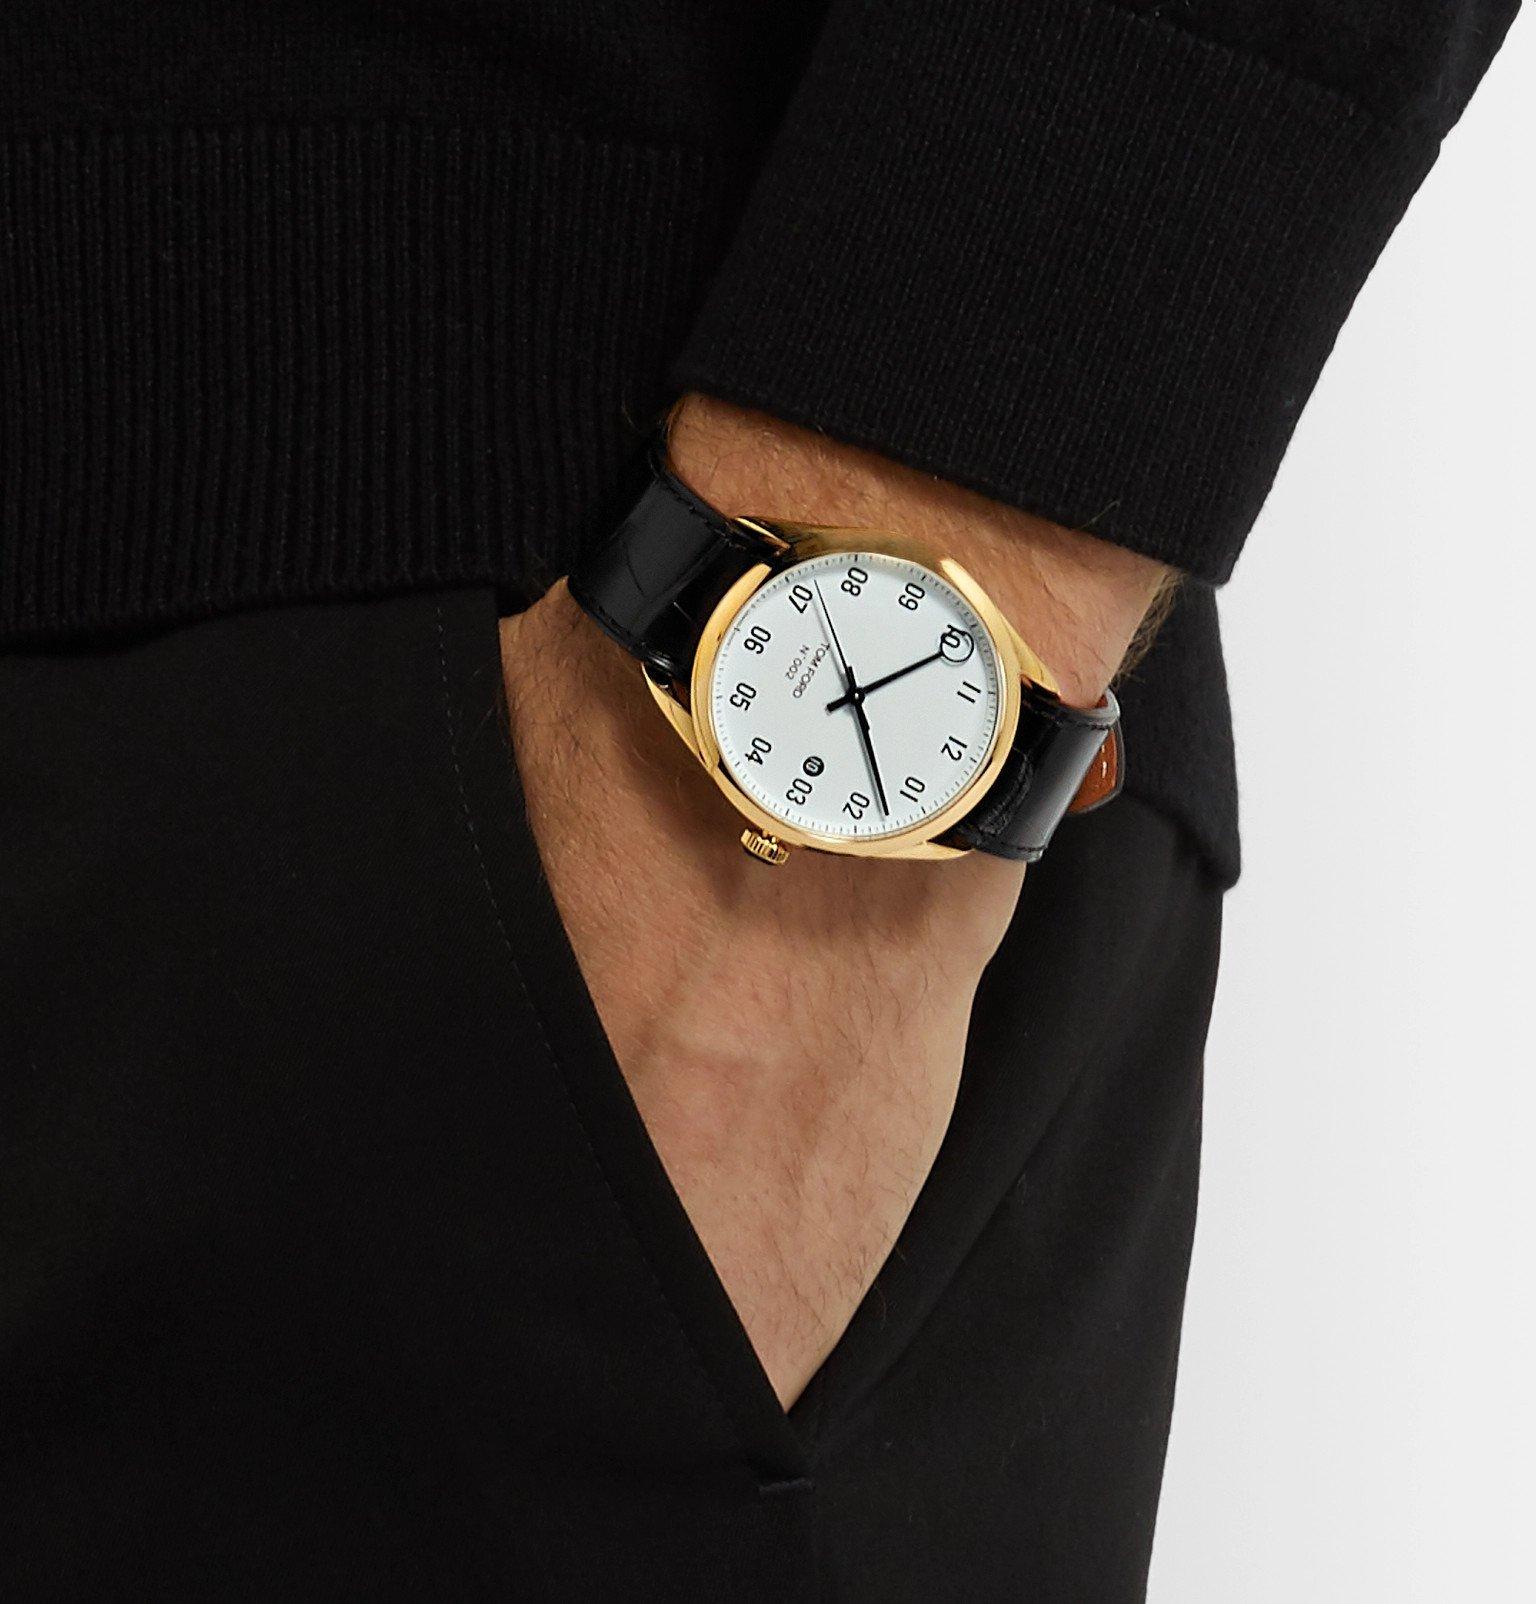 Tom Ford Timepieces - 002 40mm 18-Karat Gold and Alligator Watch - White